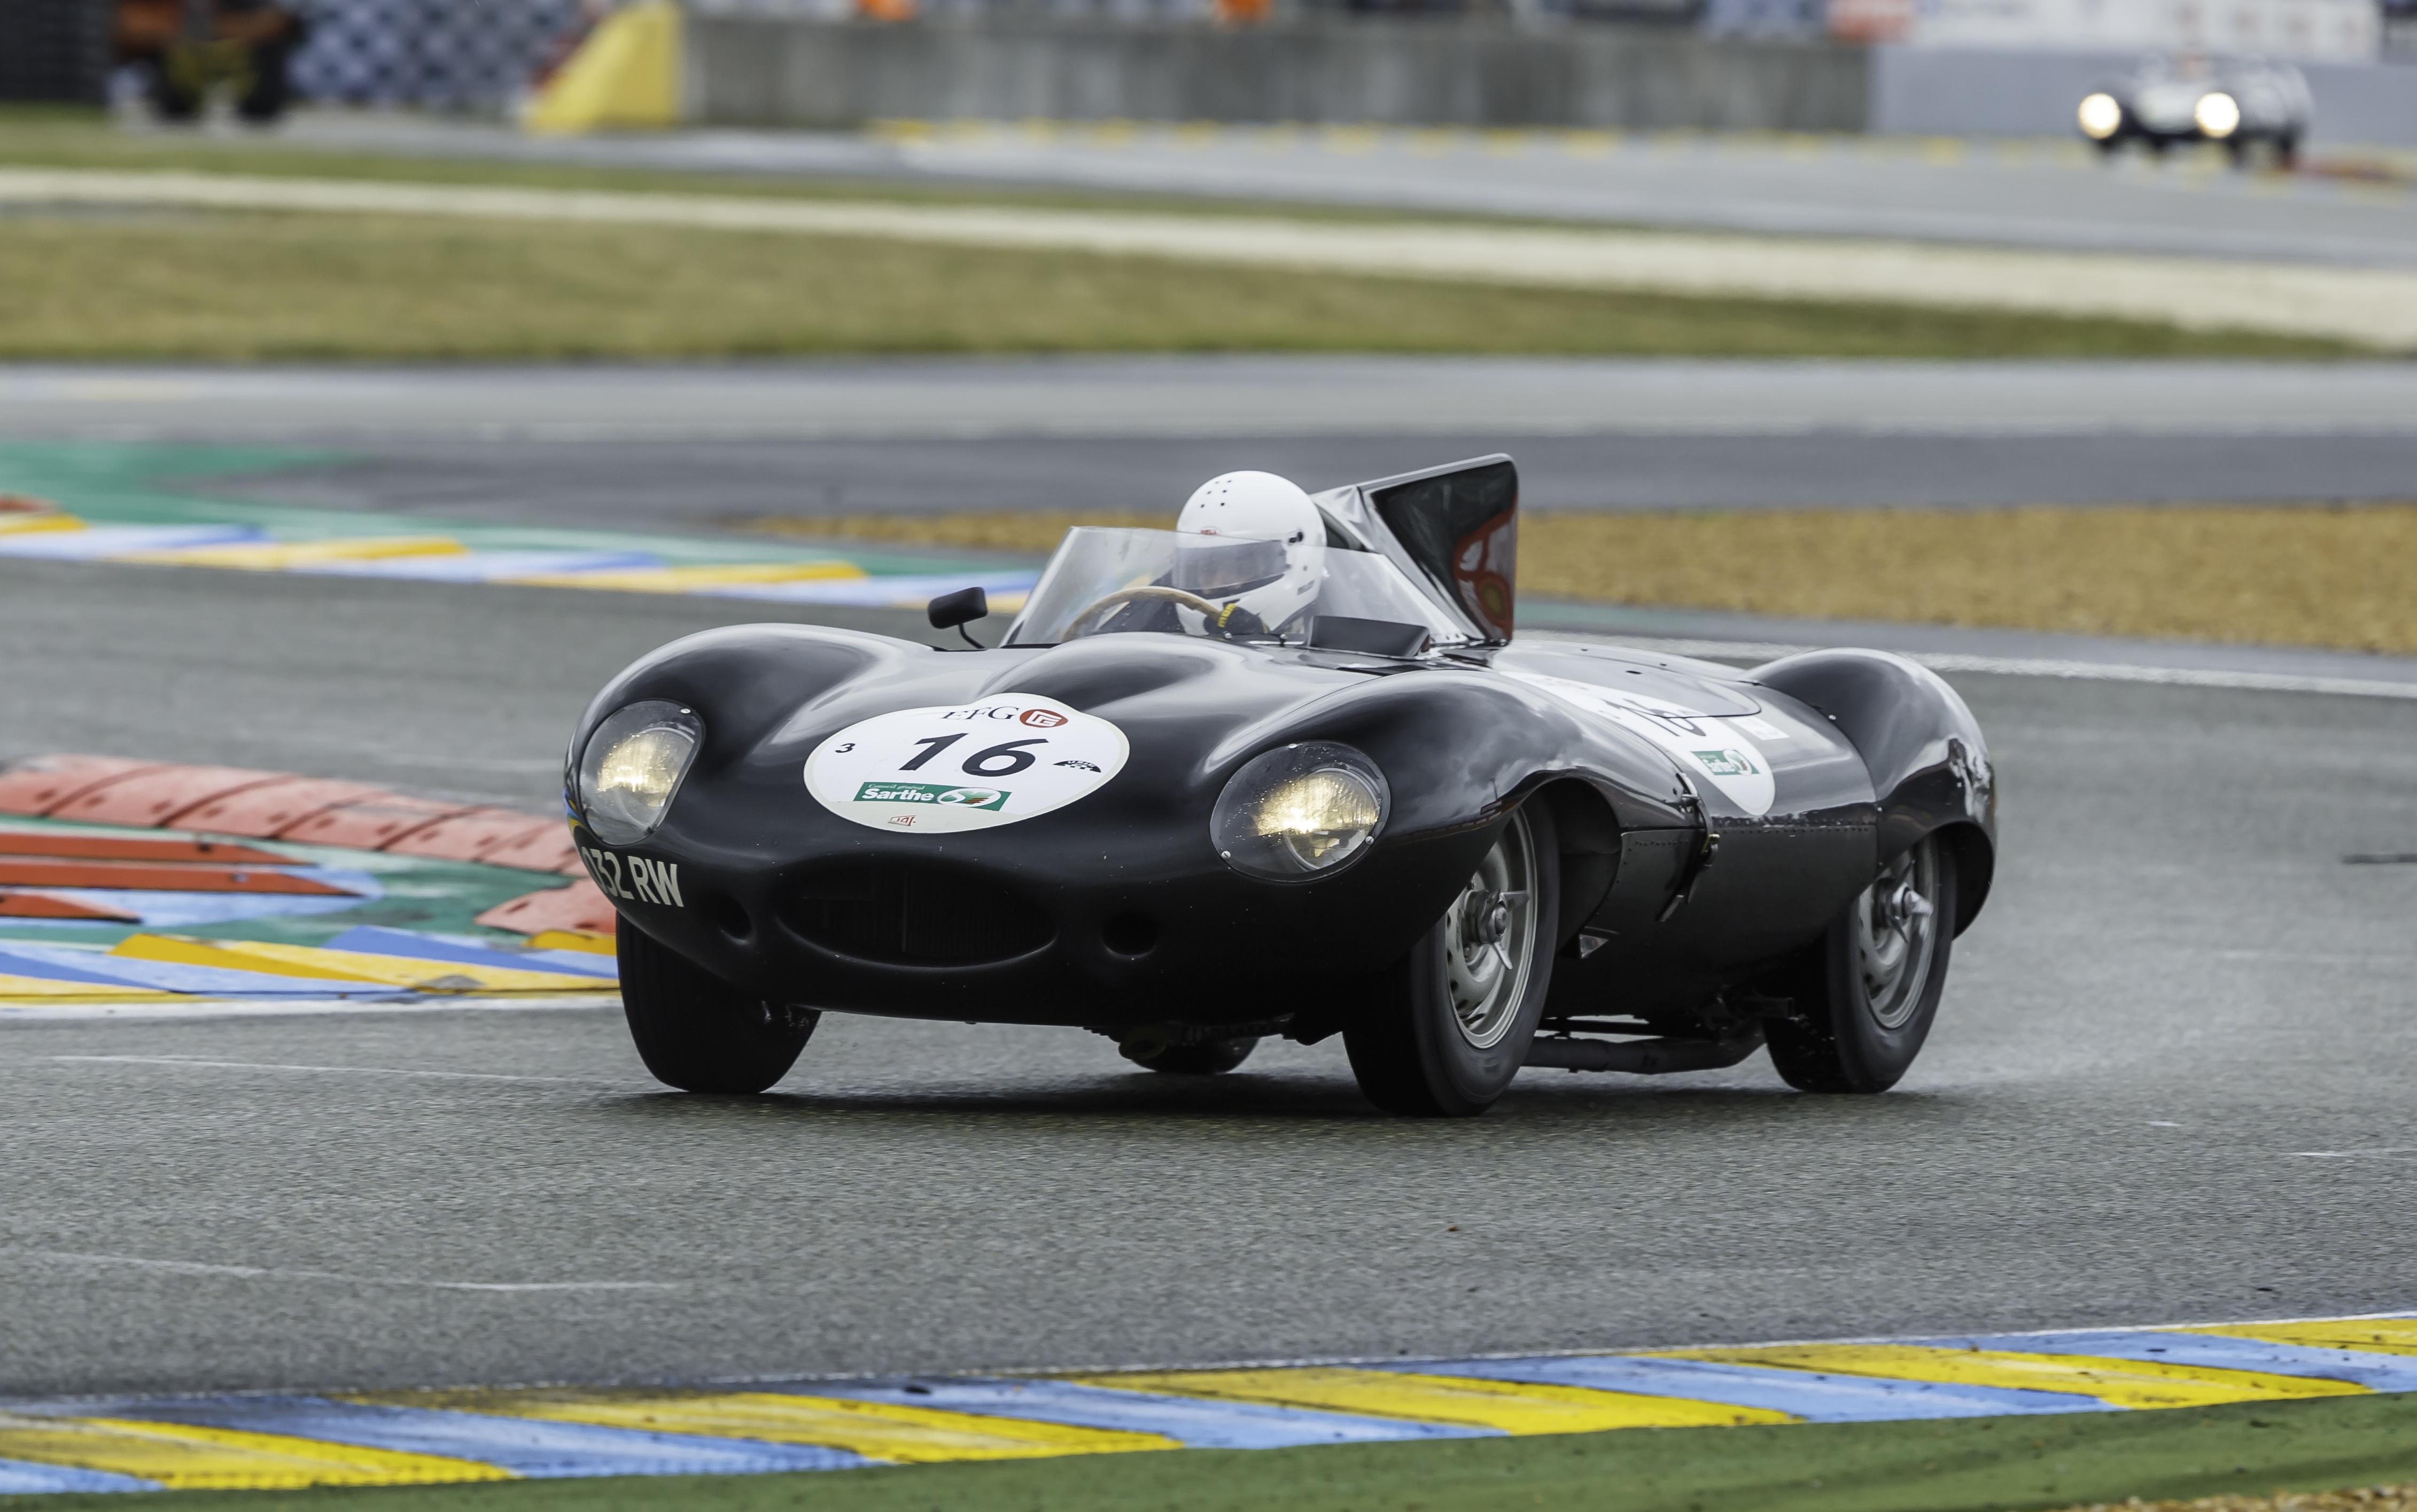 Jaguar F-TYPE PROJECT 7 Makes World Dynamic Debut as D ...